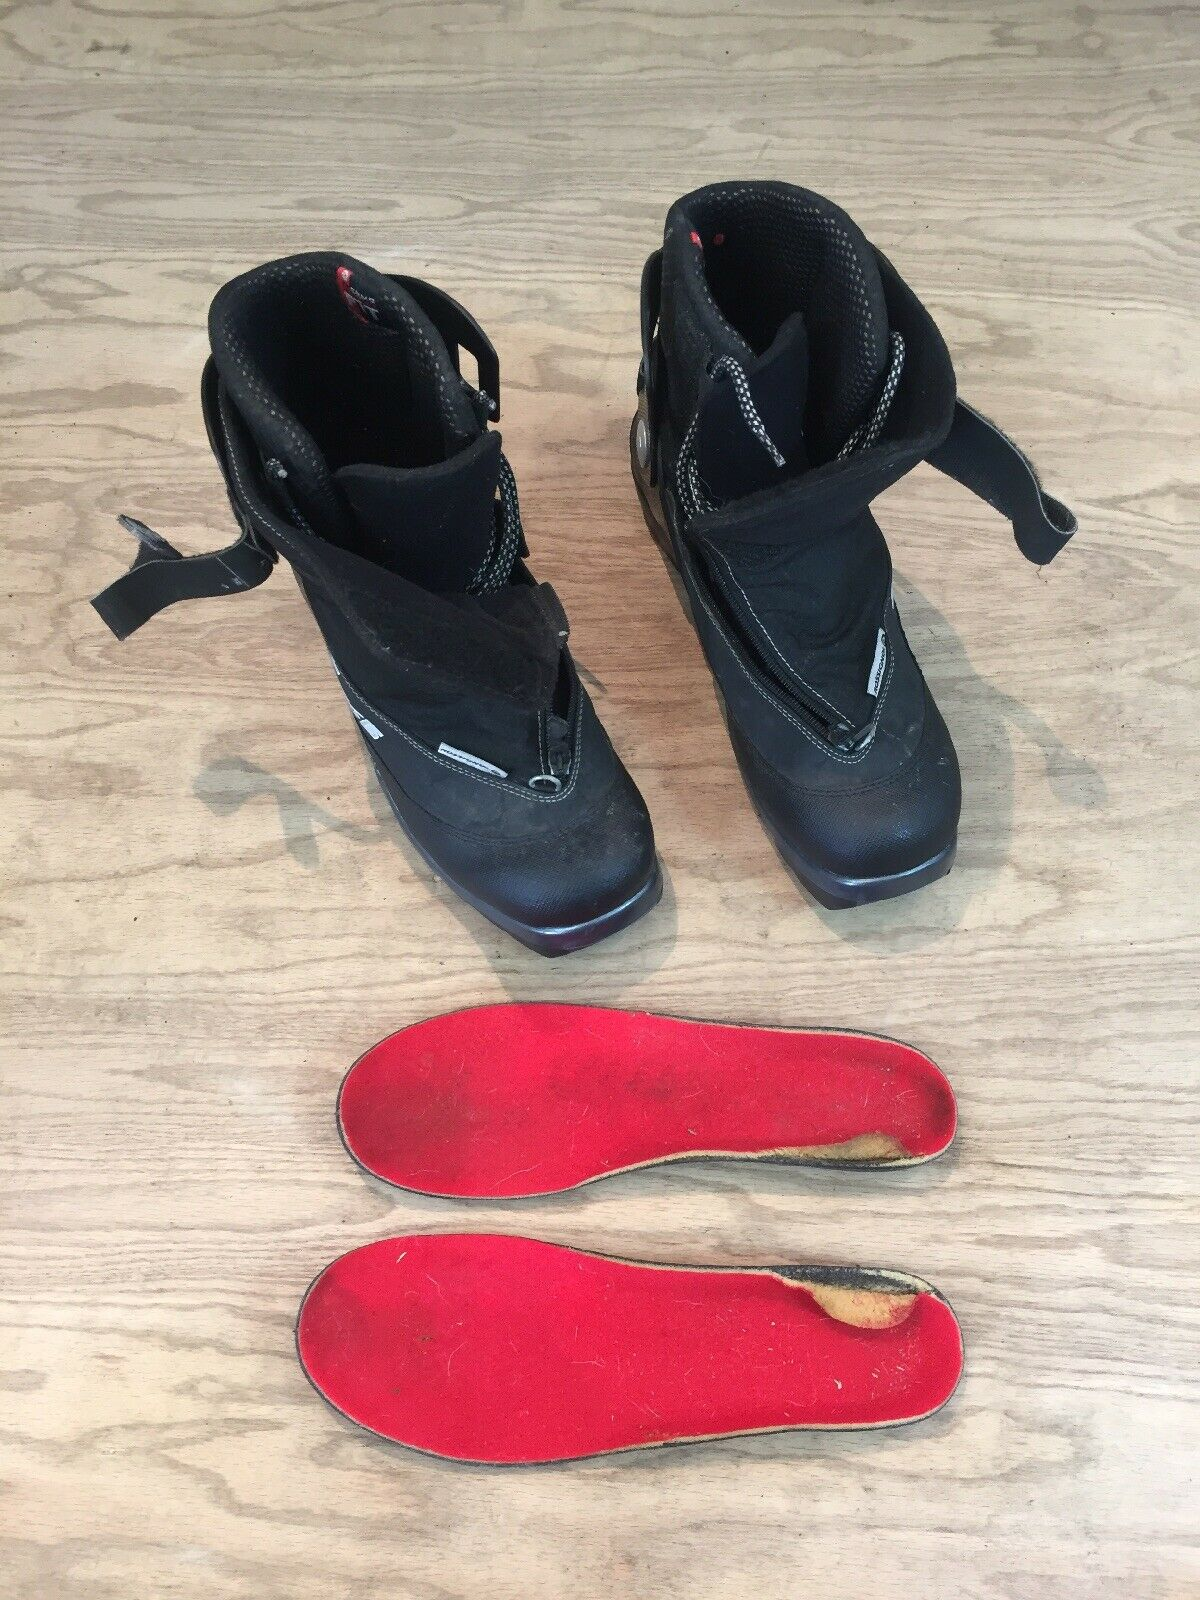 X6 Combi NNN XC Ski Boot